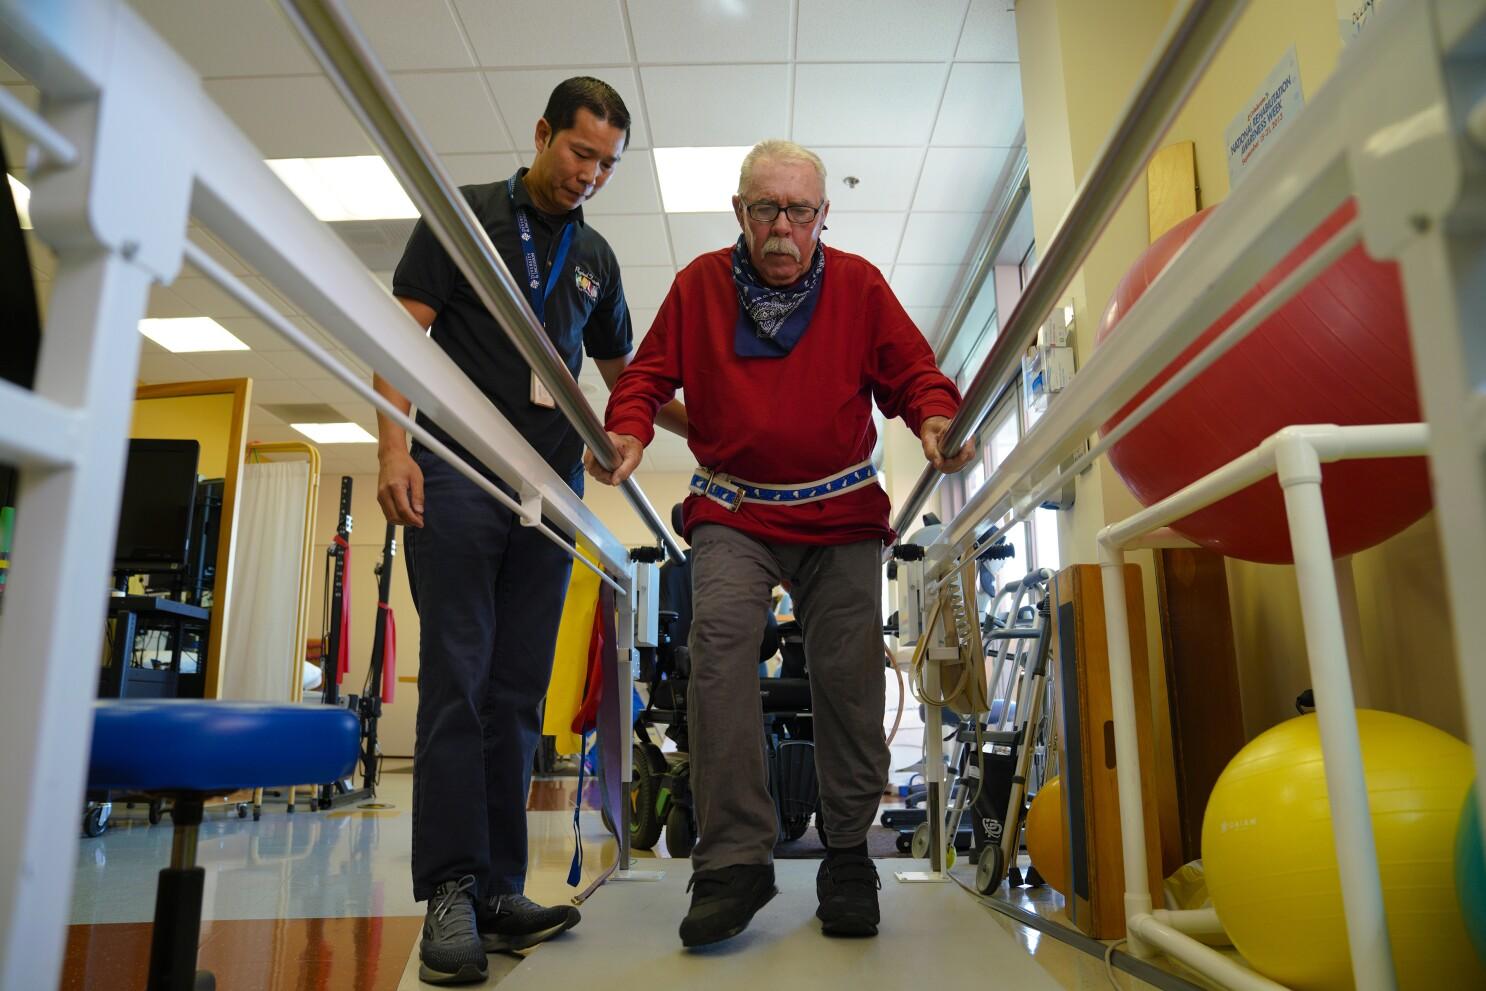 Newsweek: Edgemoor nursing home is best in the state